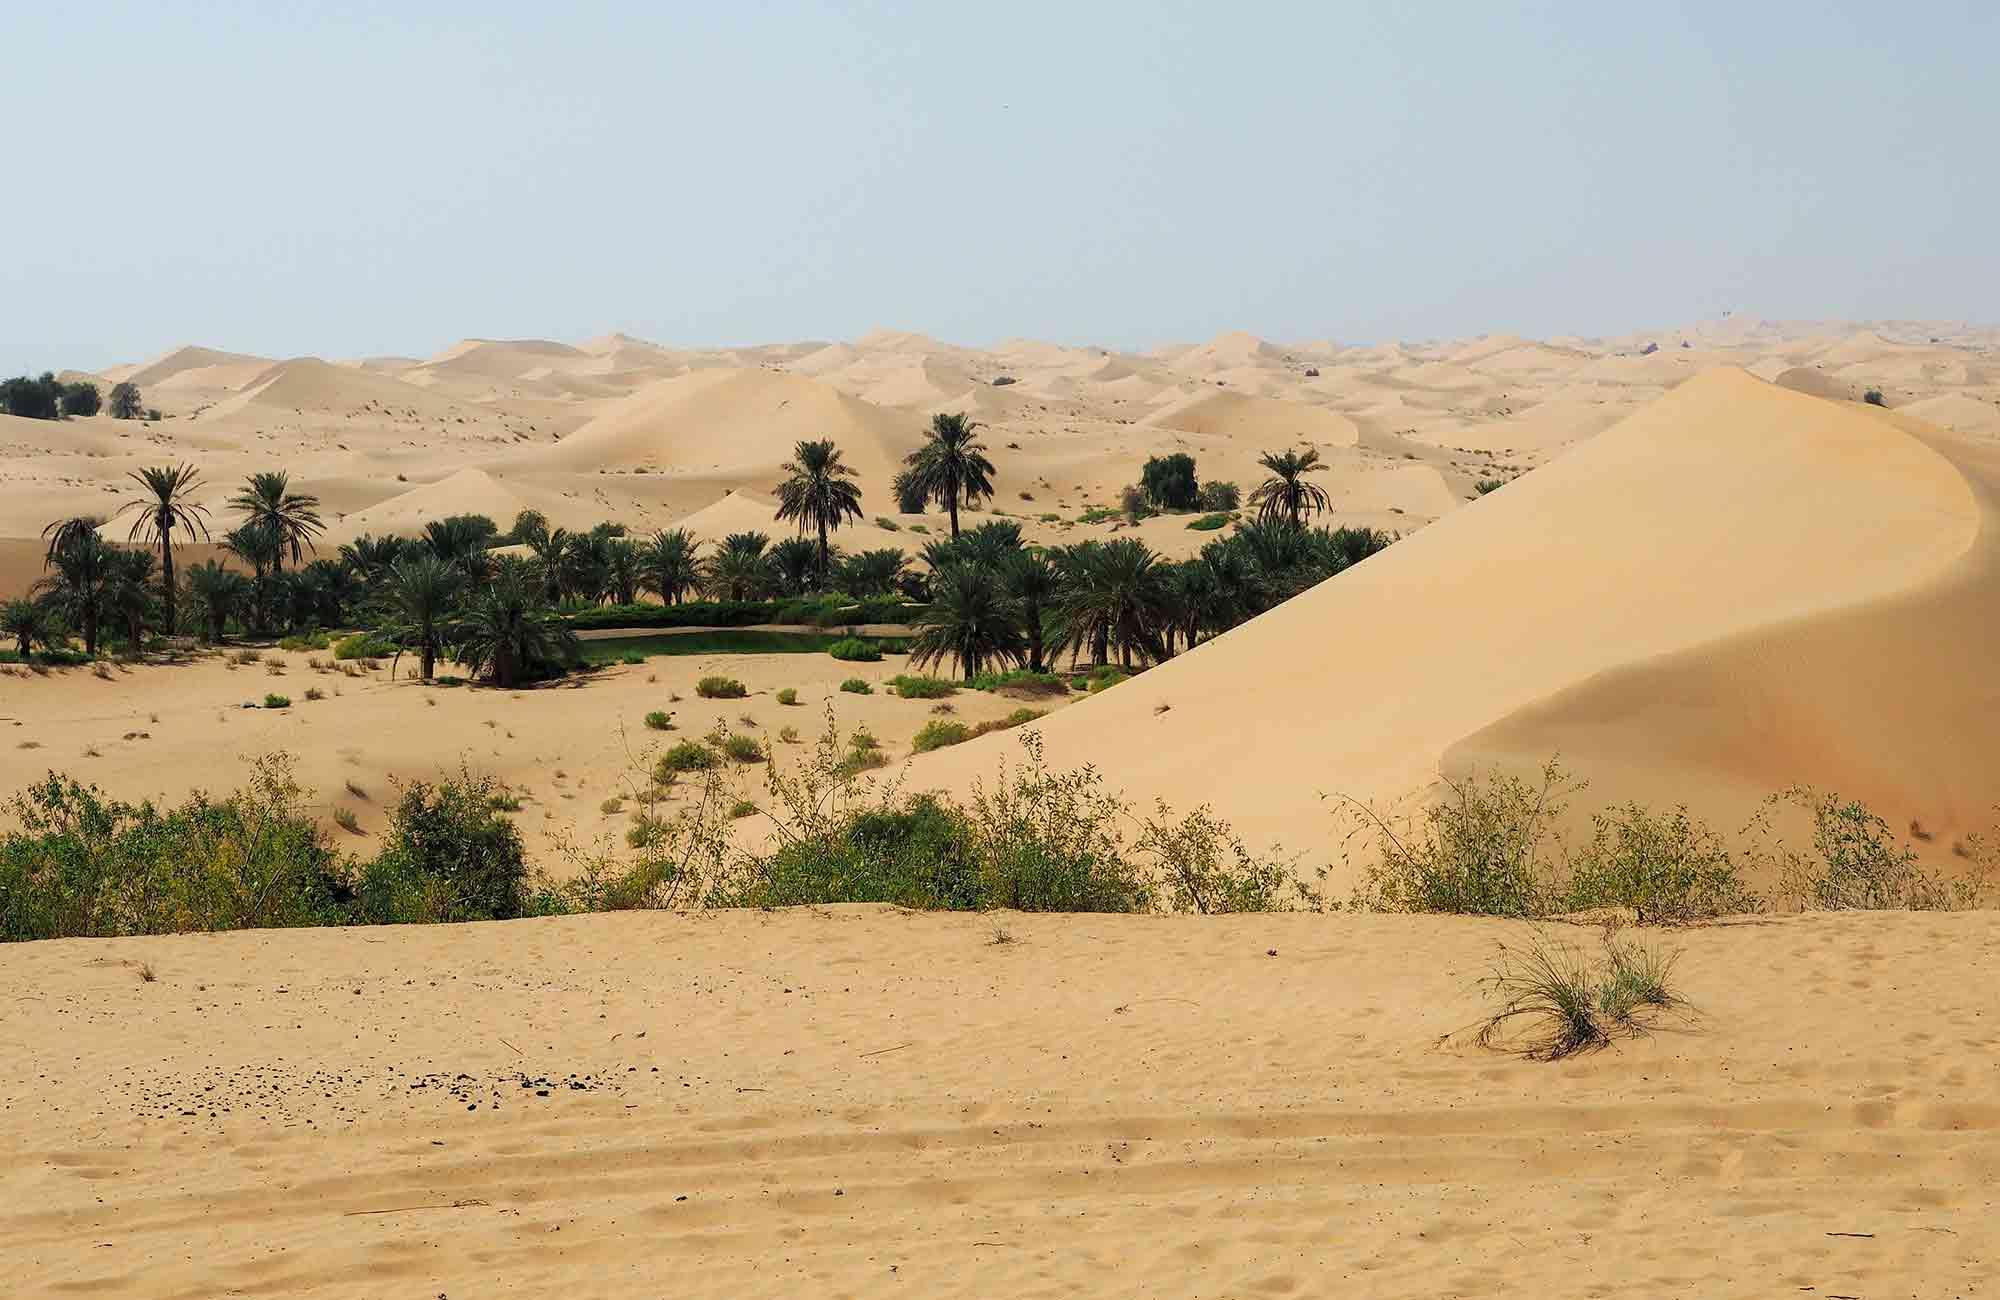 Voyage Abu Dhabi - Désert - Amplitudes